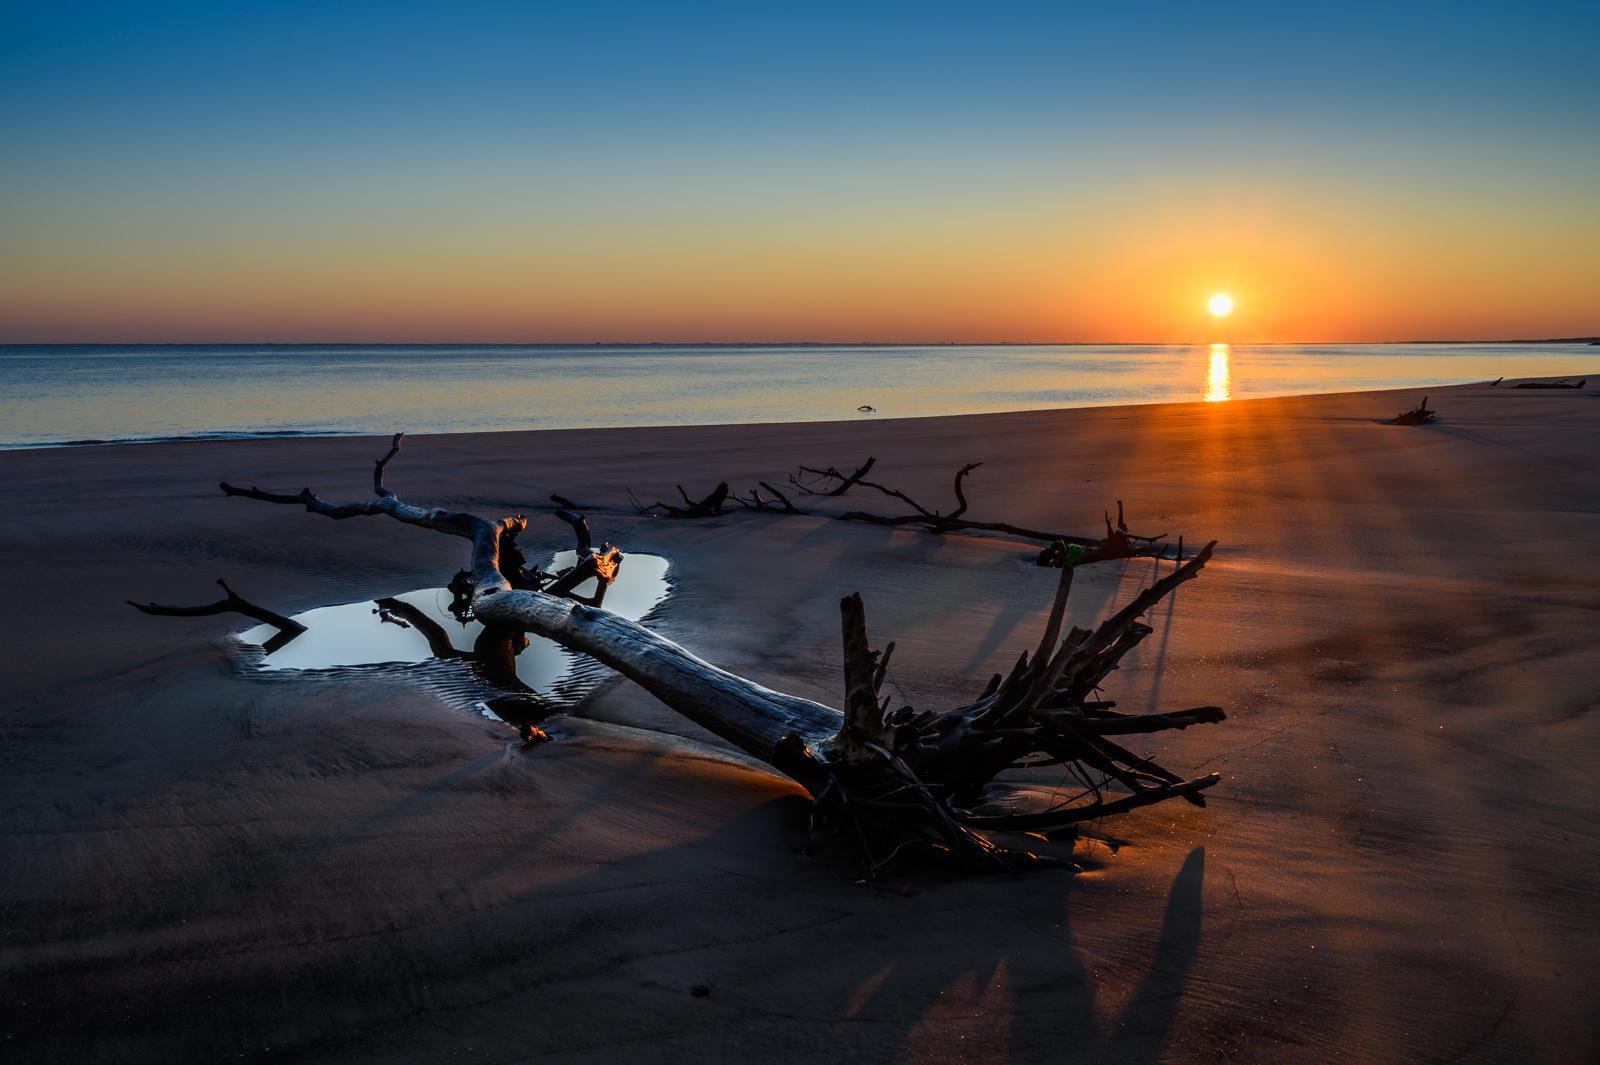 Boneyard Beach, Big Talbot Island, FL